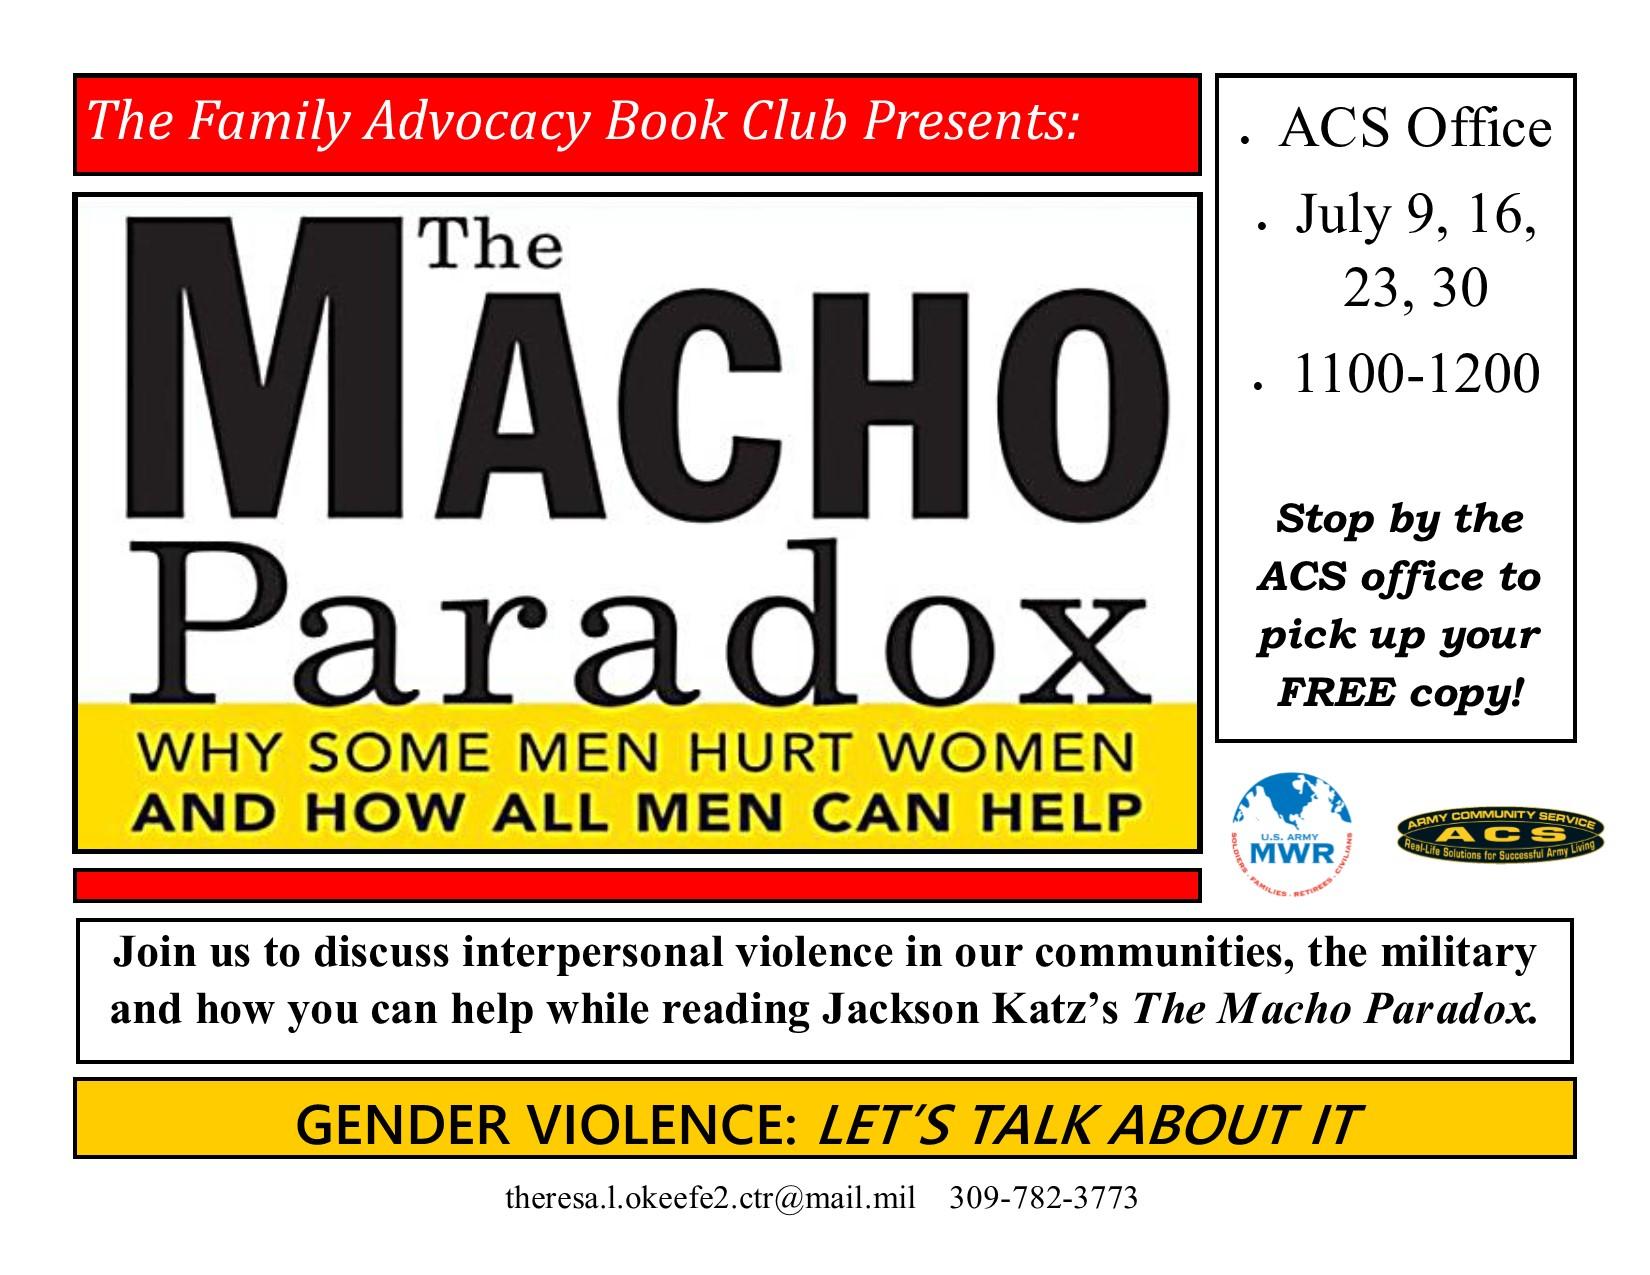 Family Advocacy Book Club: The Macho Paradox